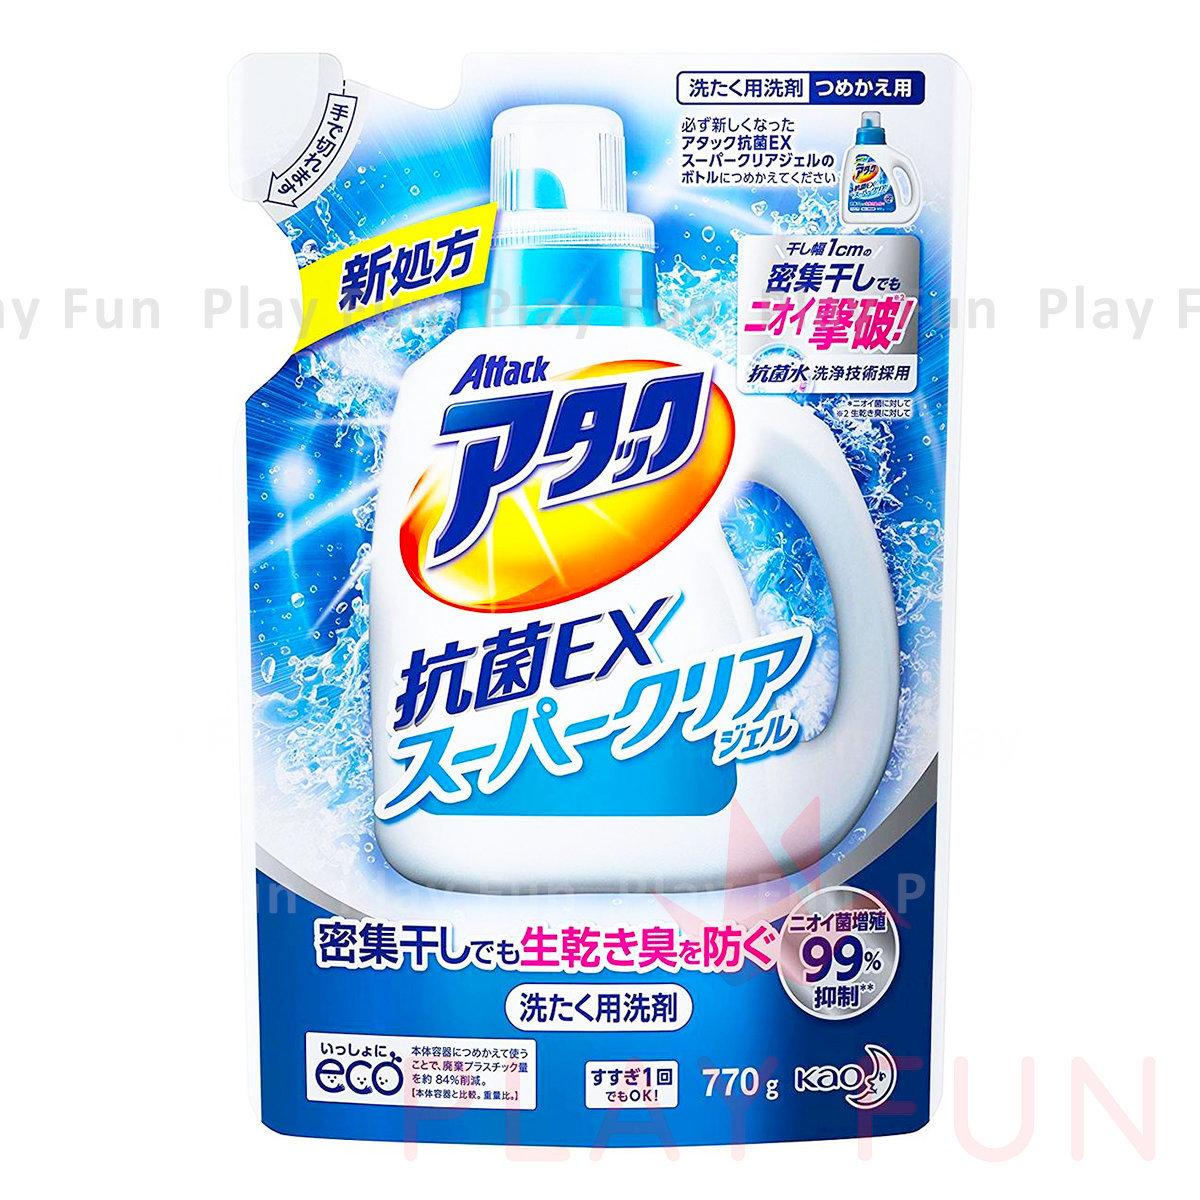 Attack抗菌EX洗衣液((補充裝)) 770g  (4901301335180_1)